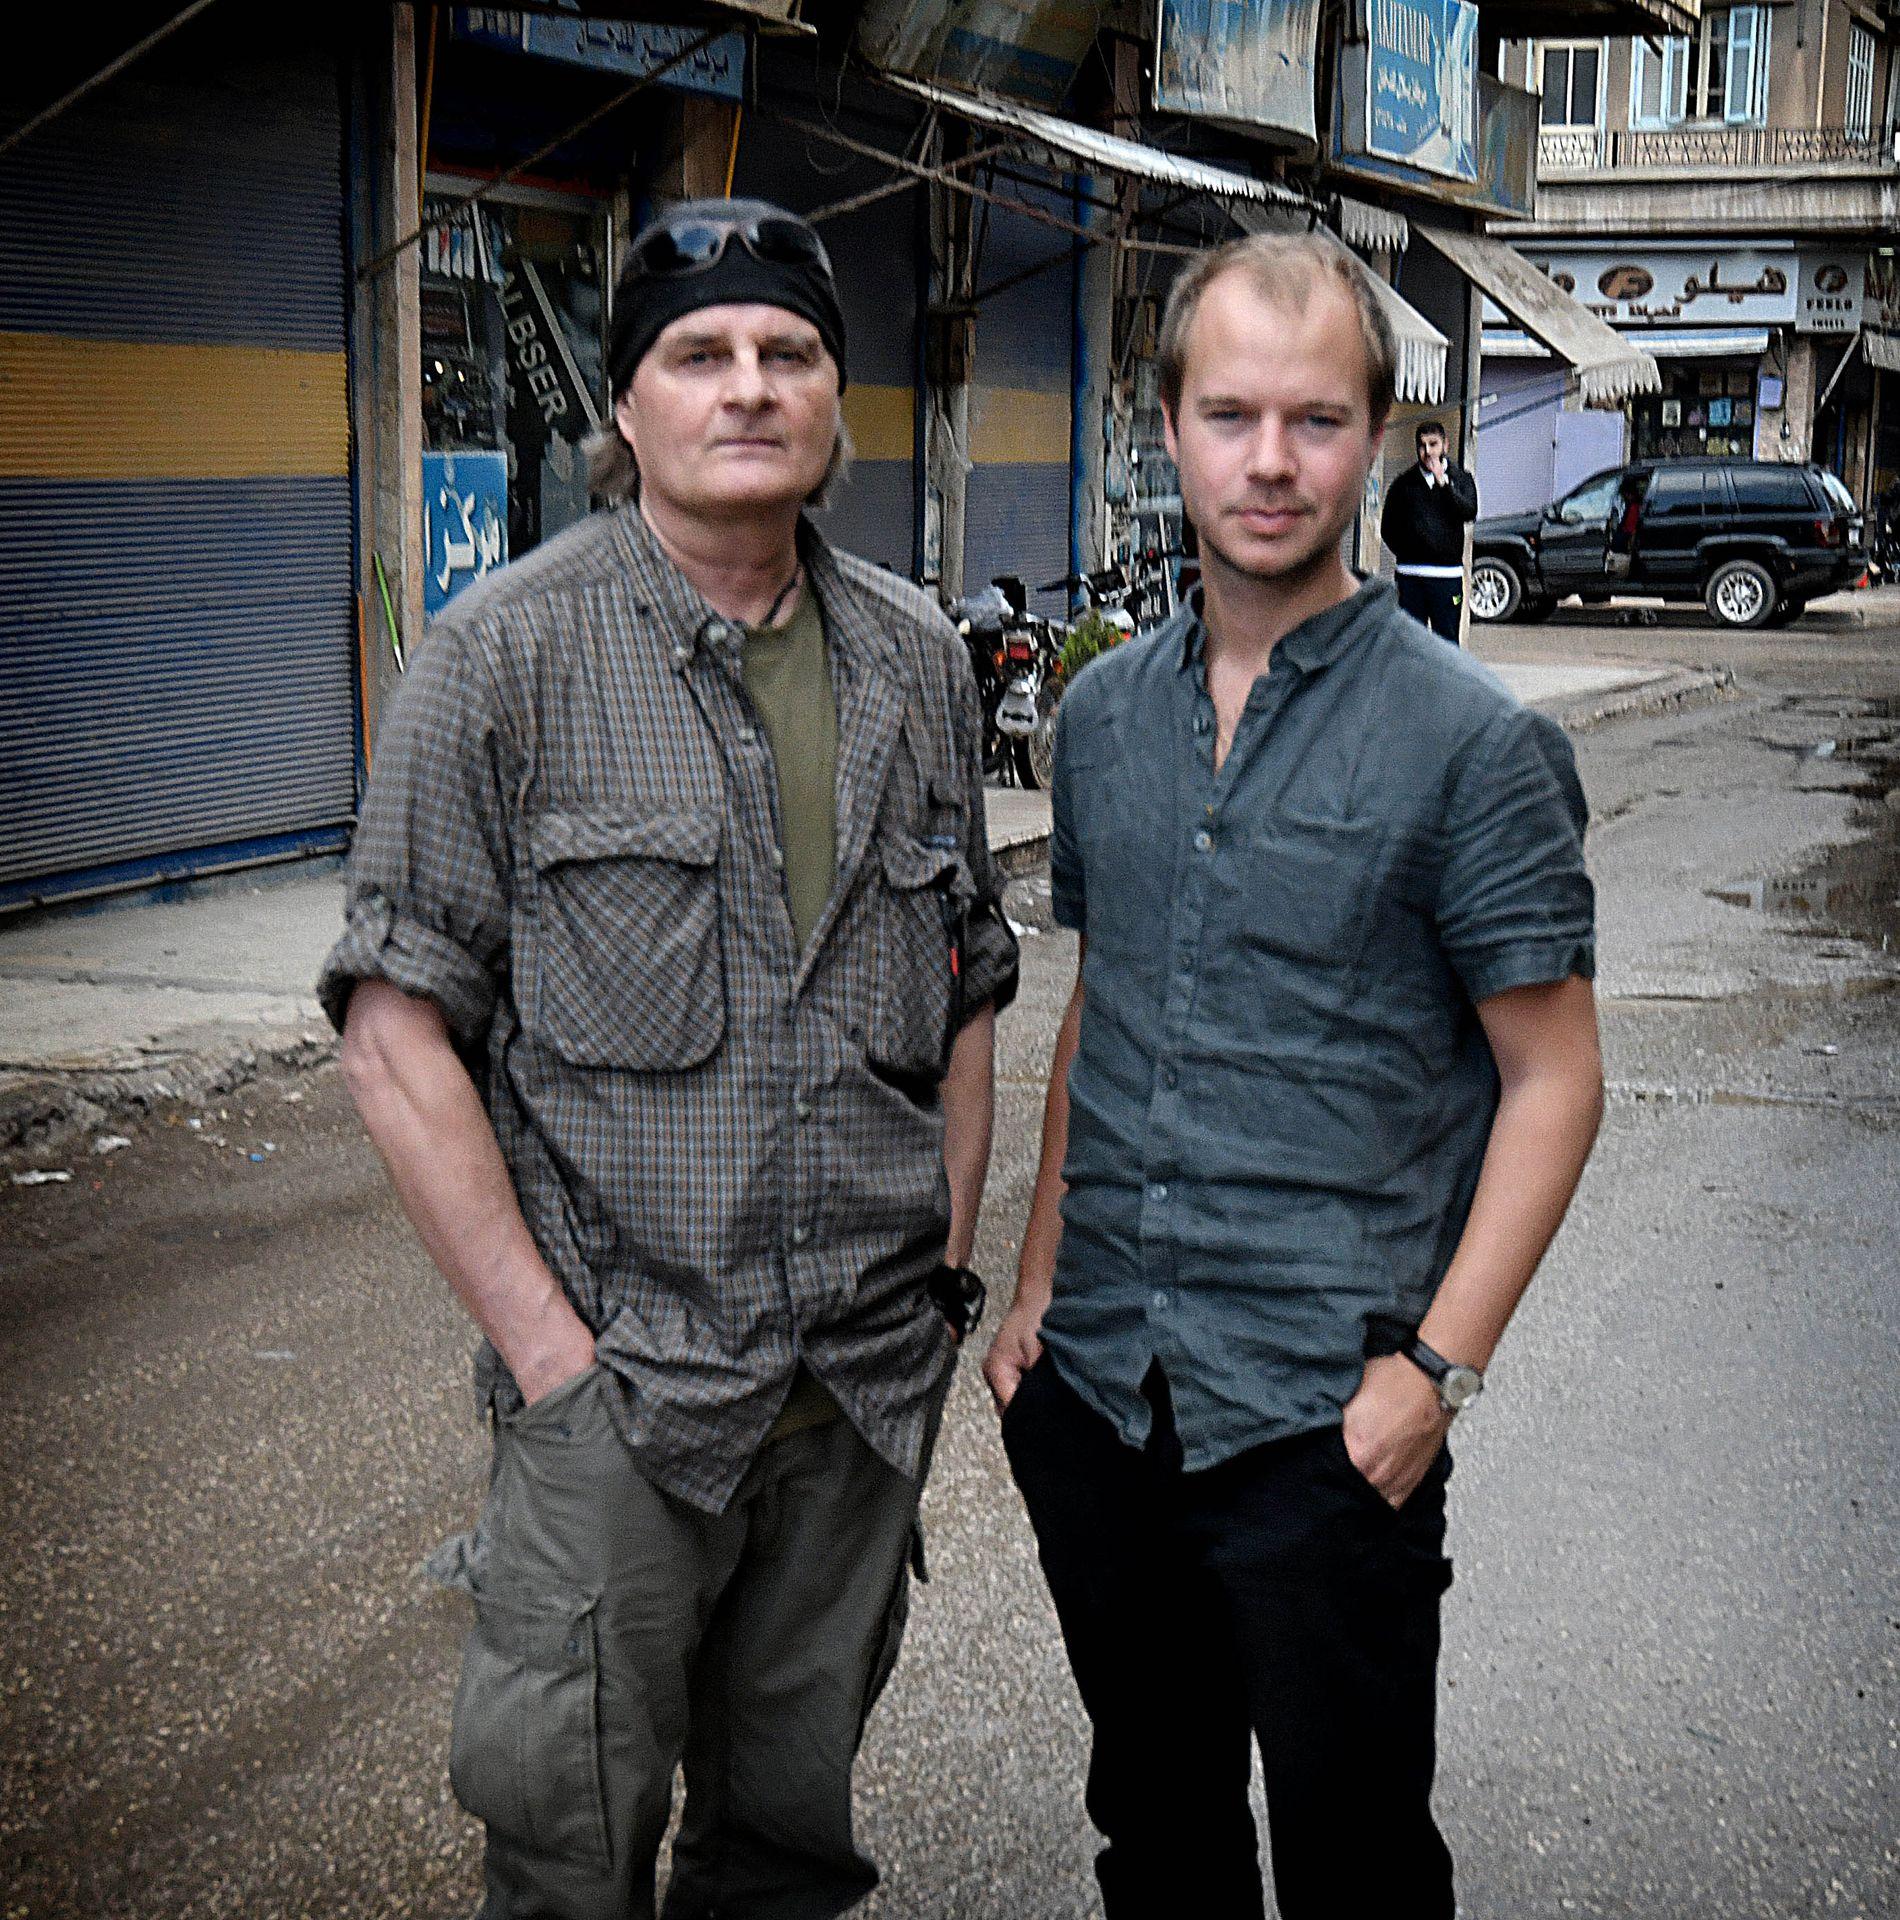 VG I SYRIA: Harald Henden og Amund Bakke Foss